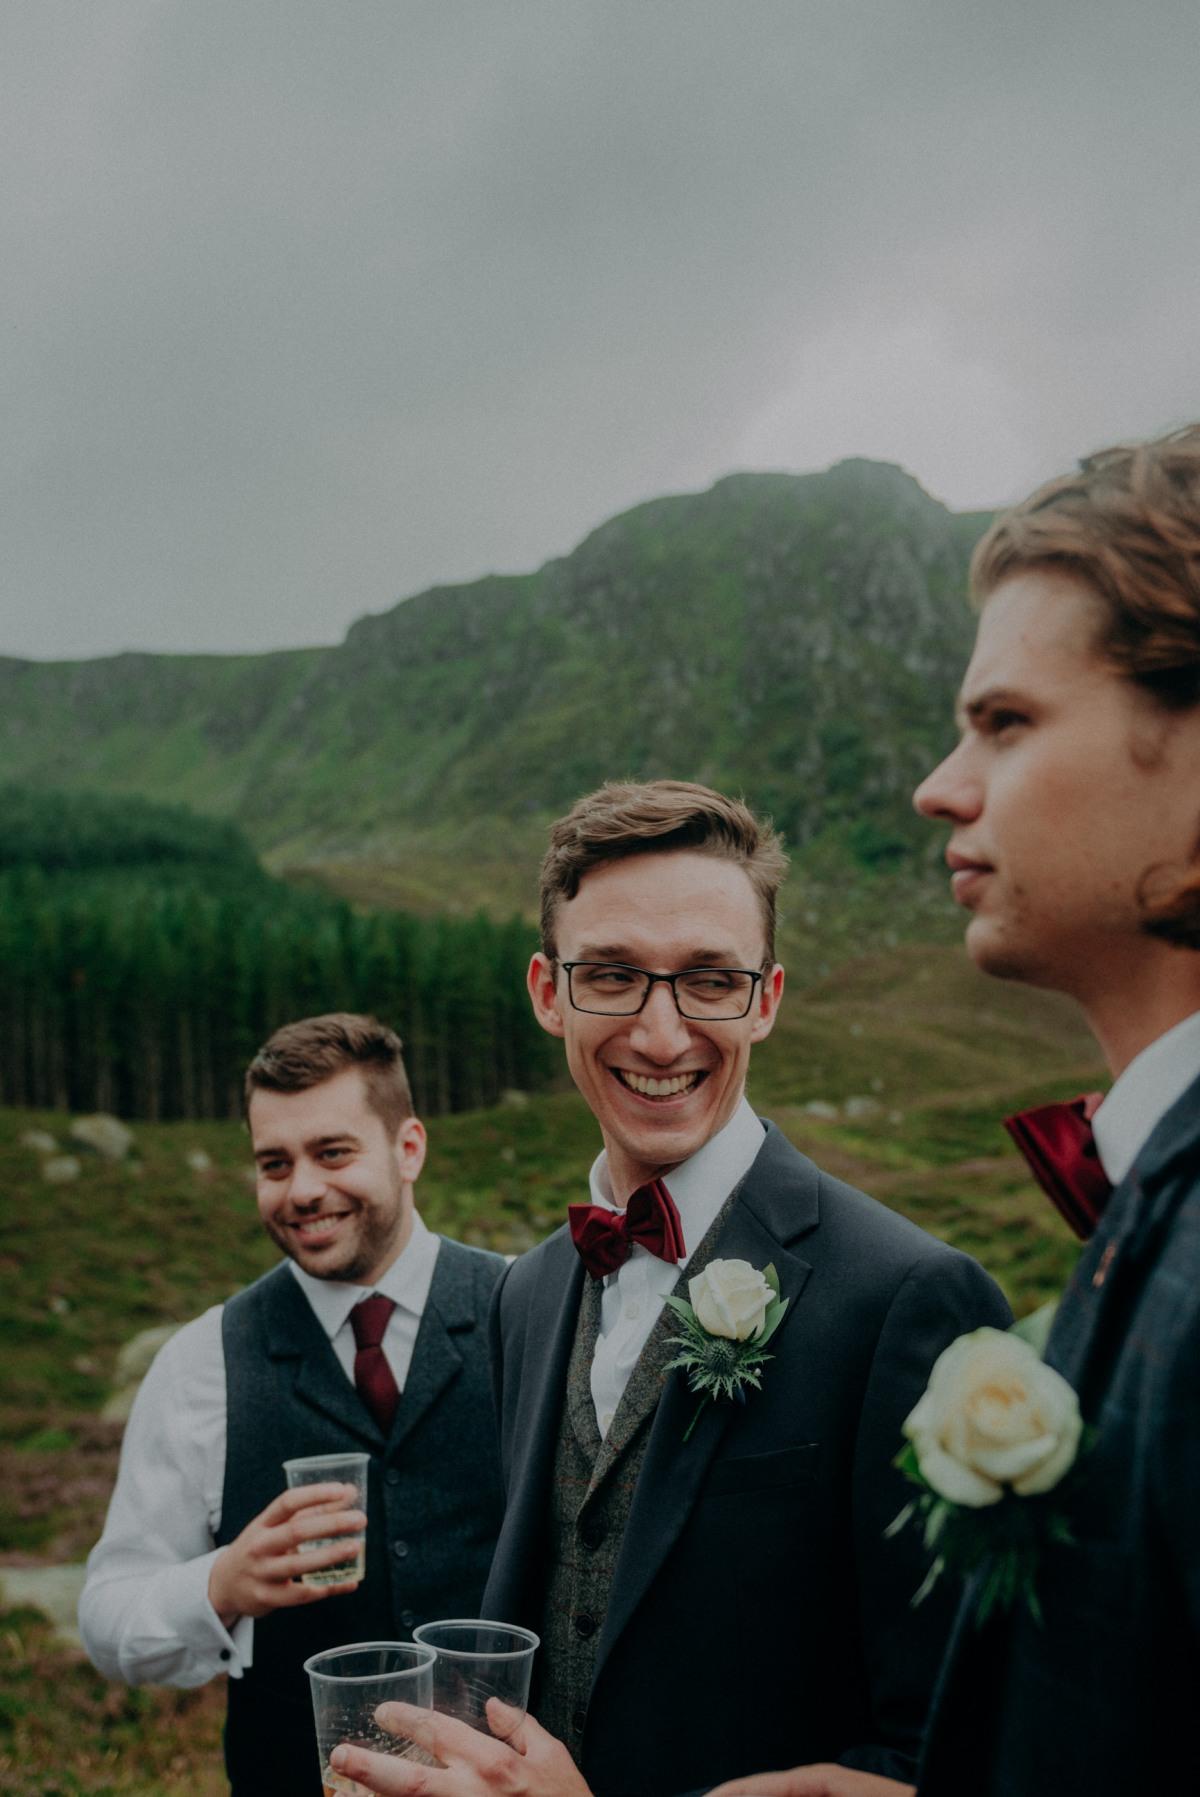 wedding-photographer-scotland-glen-clova-31